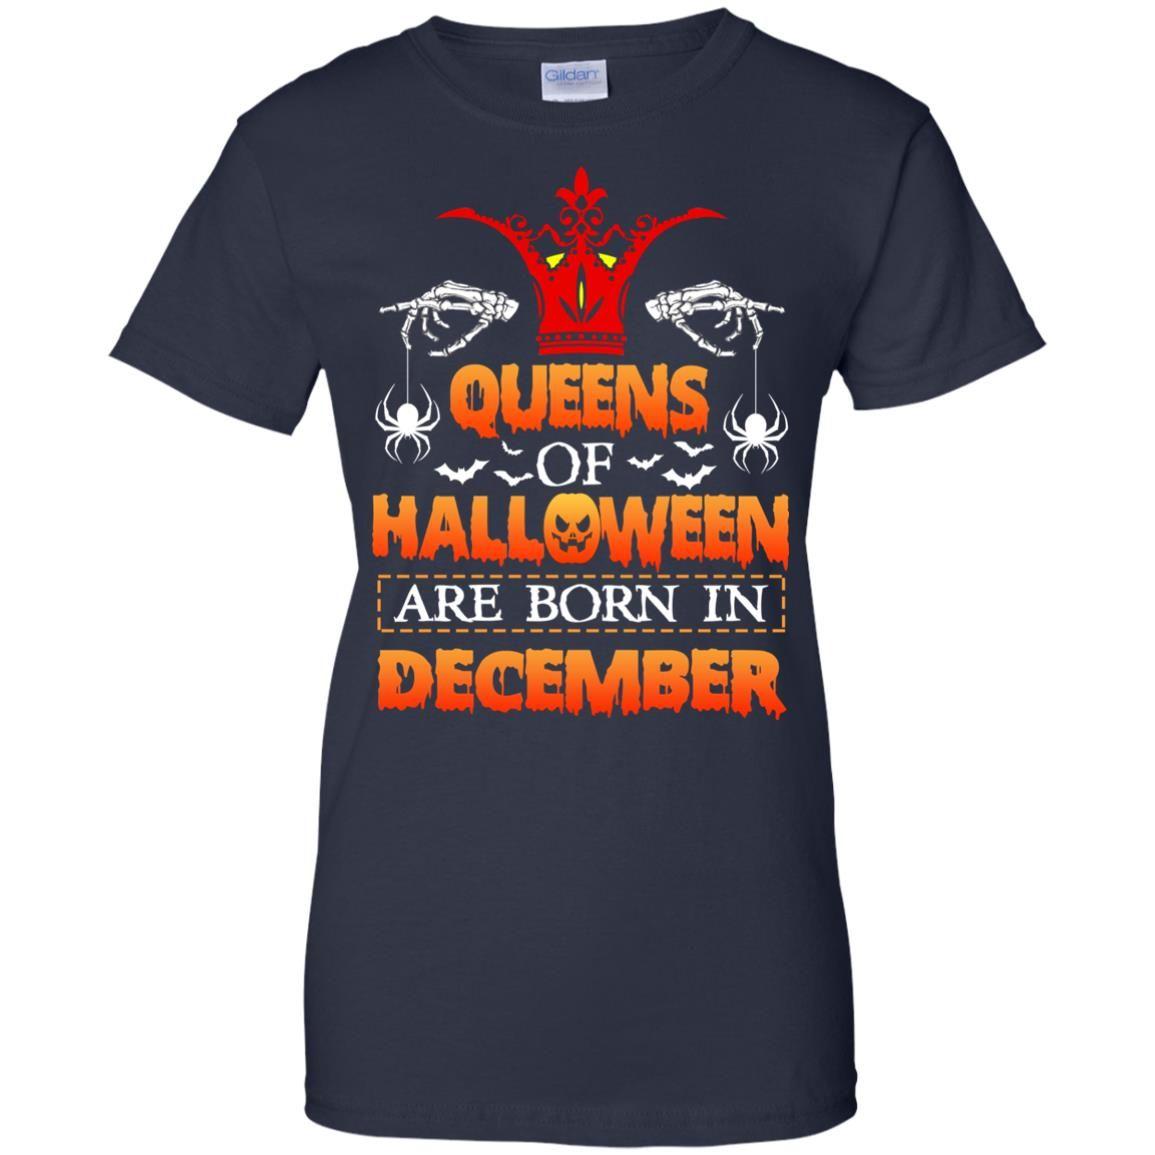 image 971 - Queens of Halloween are born in December shirt, tank top, hoodie